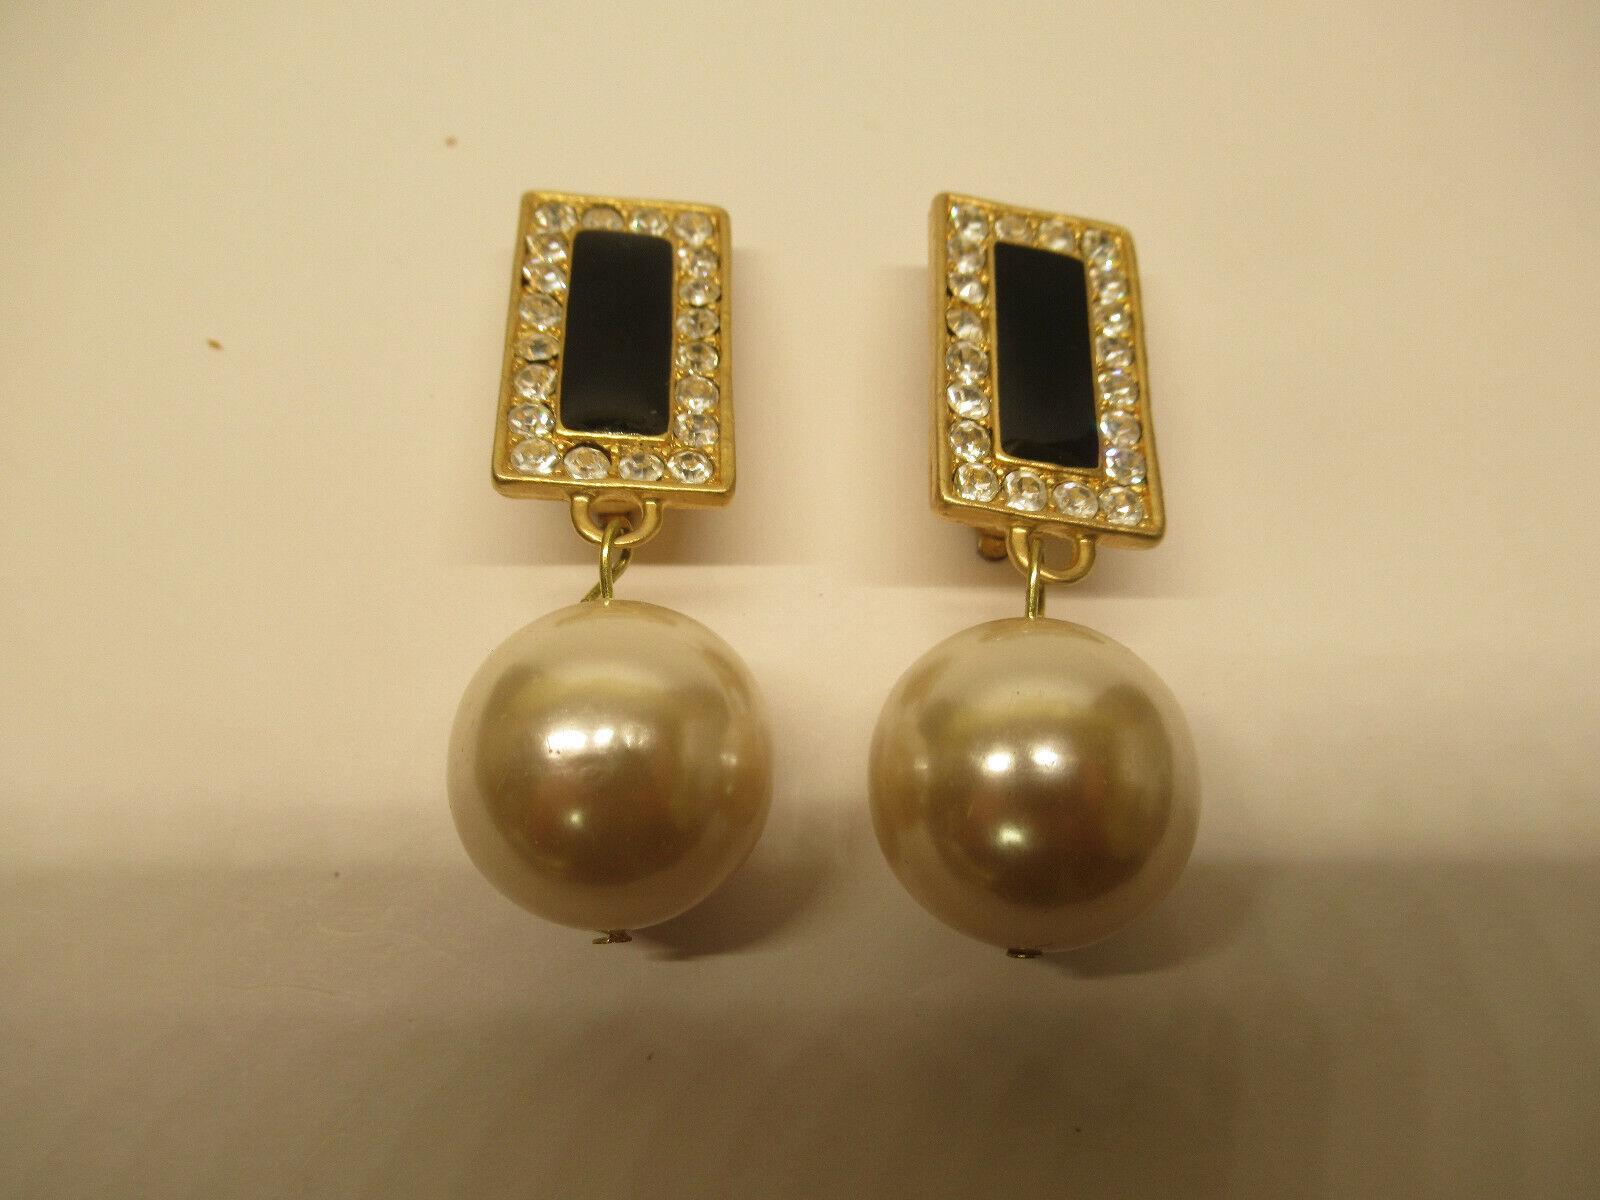 Vintage Large Faux Pearl Black Enamel Rhinestone Dangle Clip Earrings - $9.99